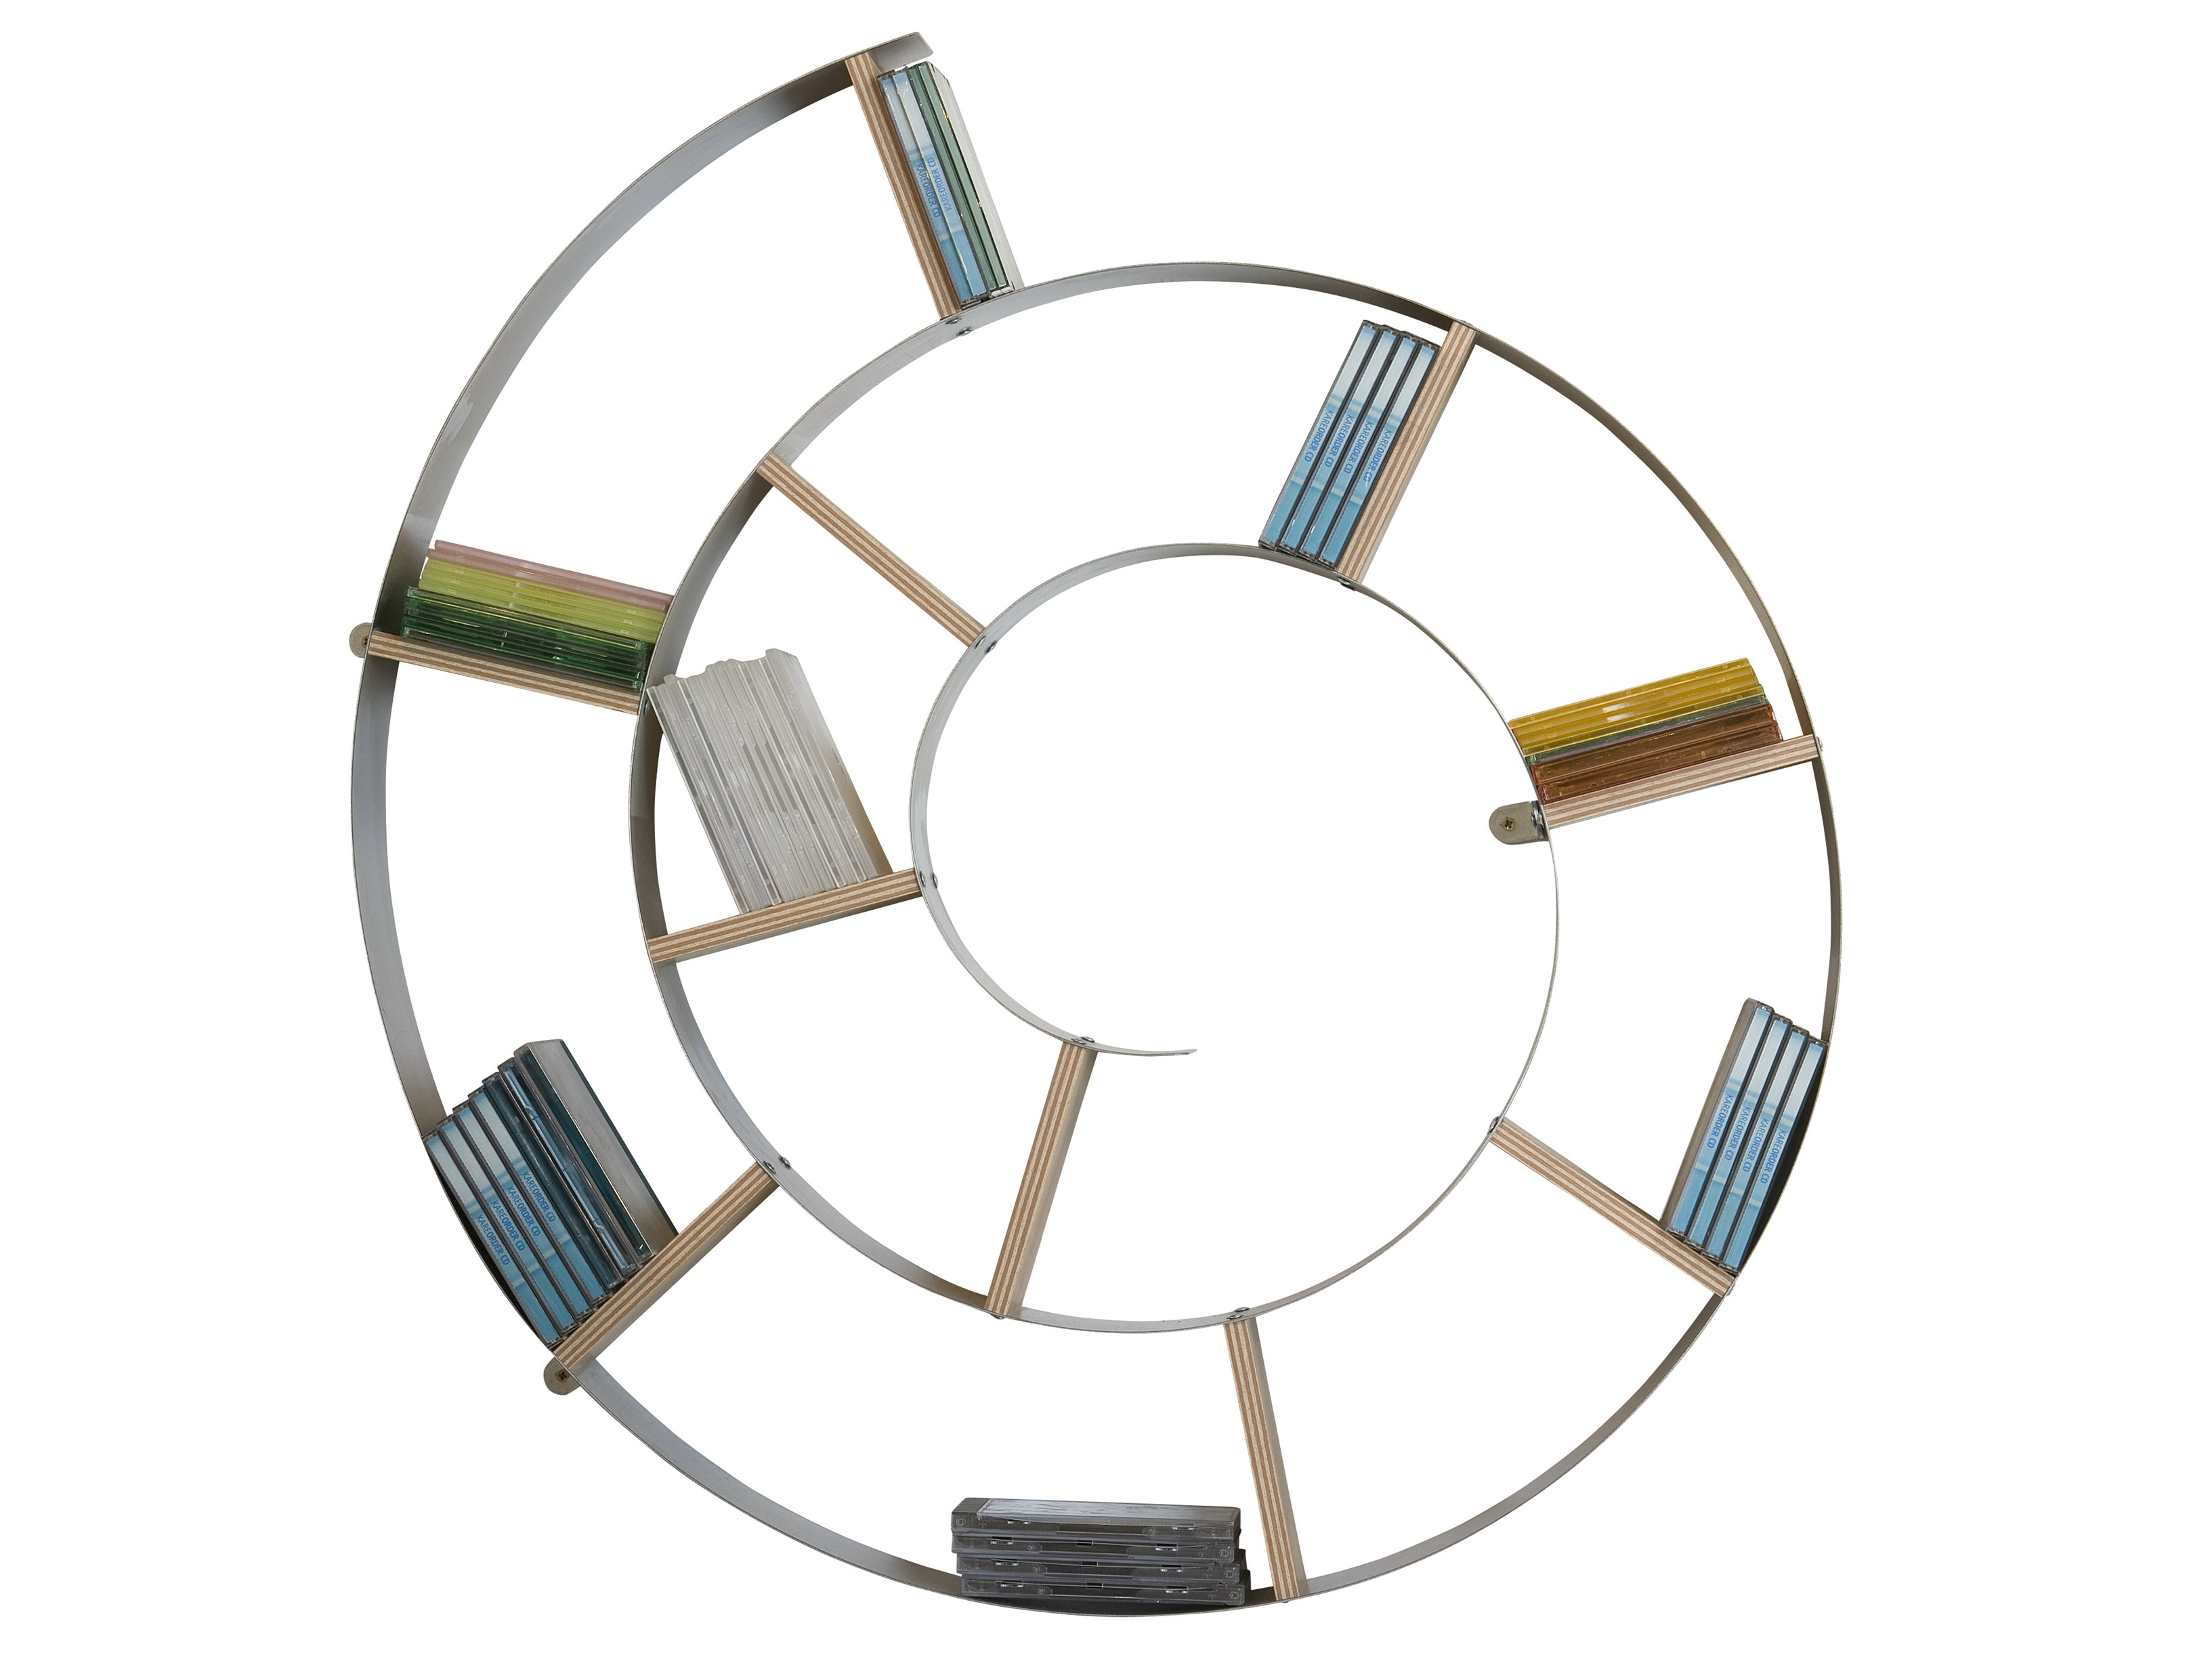 Tag re pour cd murale snail silver by kare design - Etagere murale pour cd ...